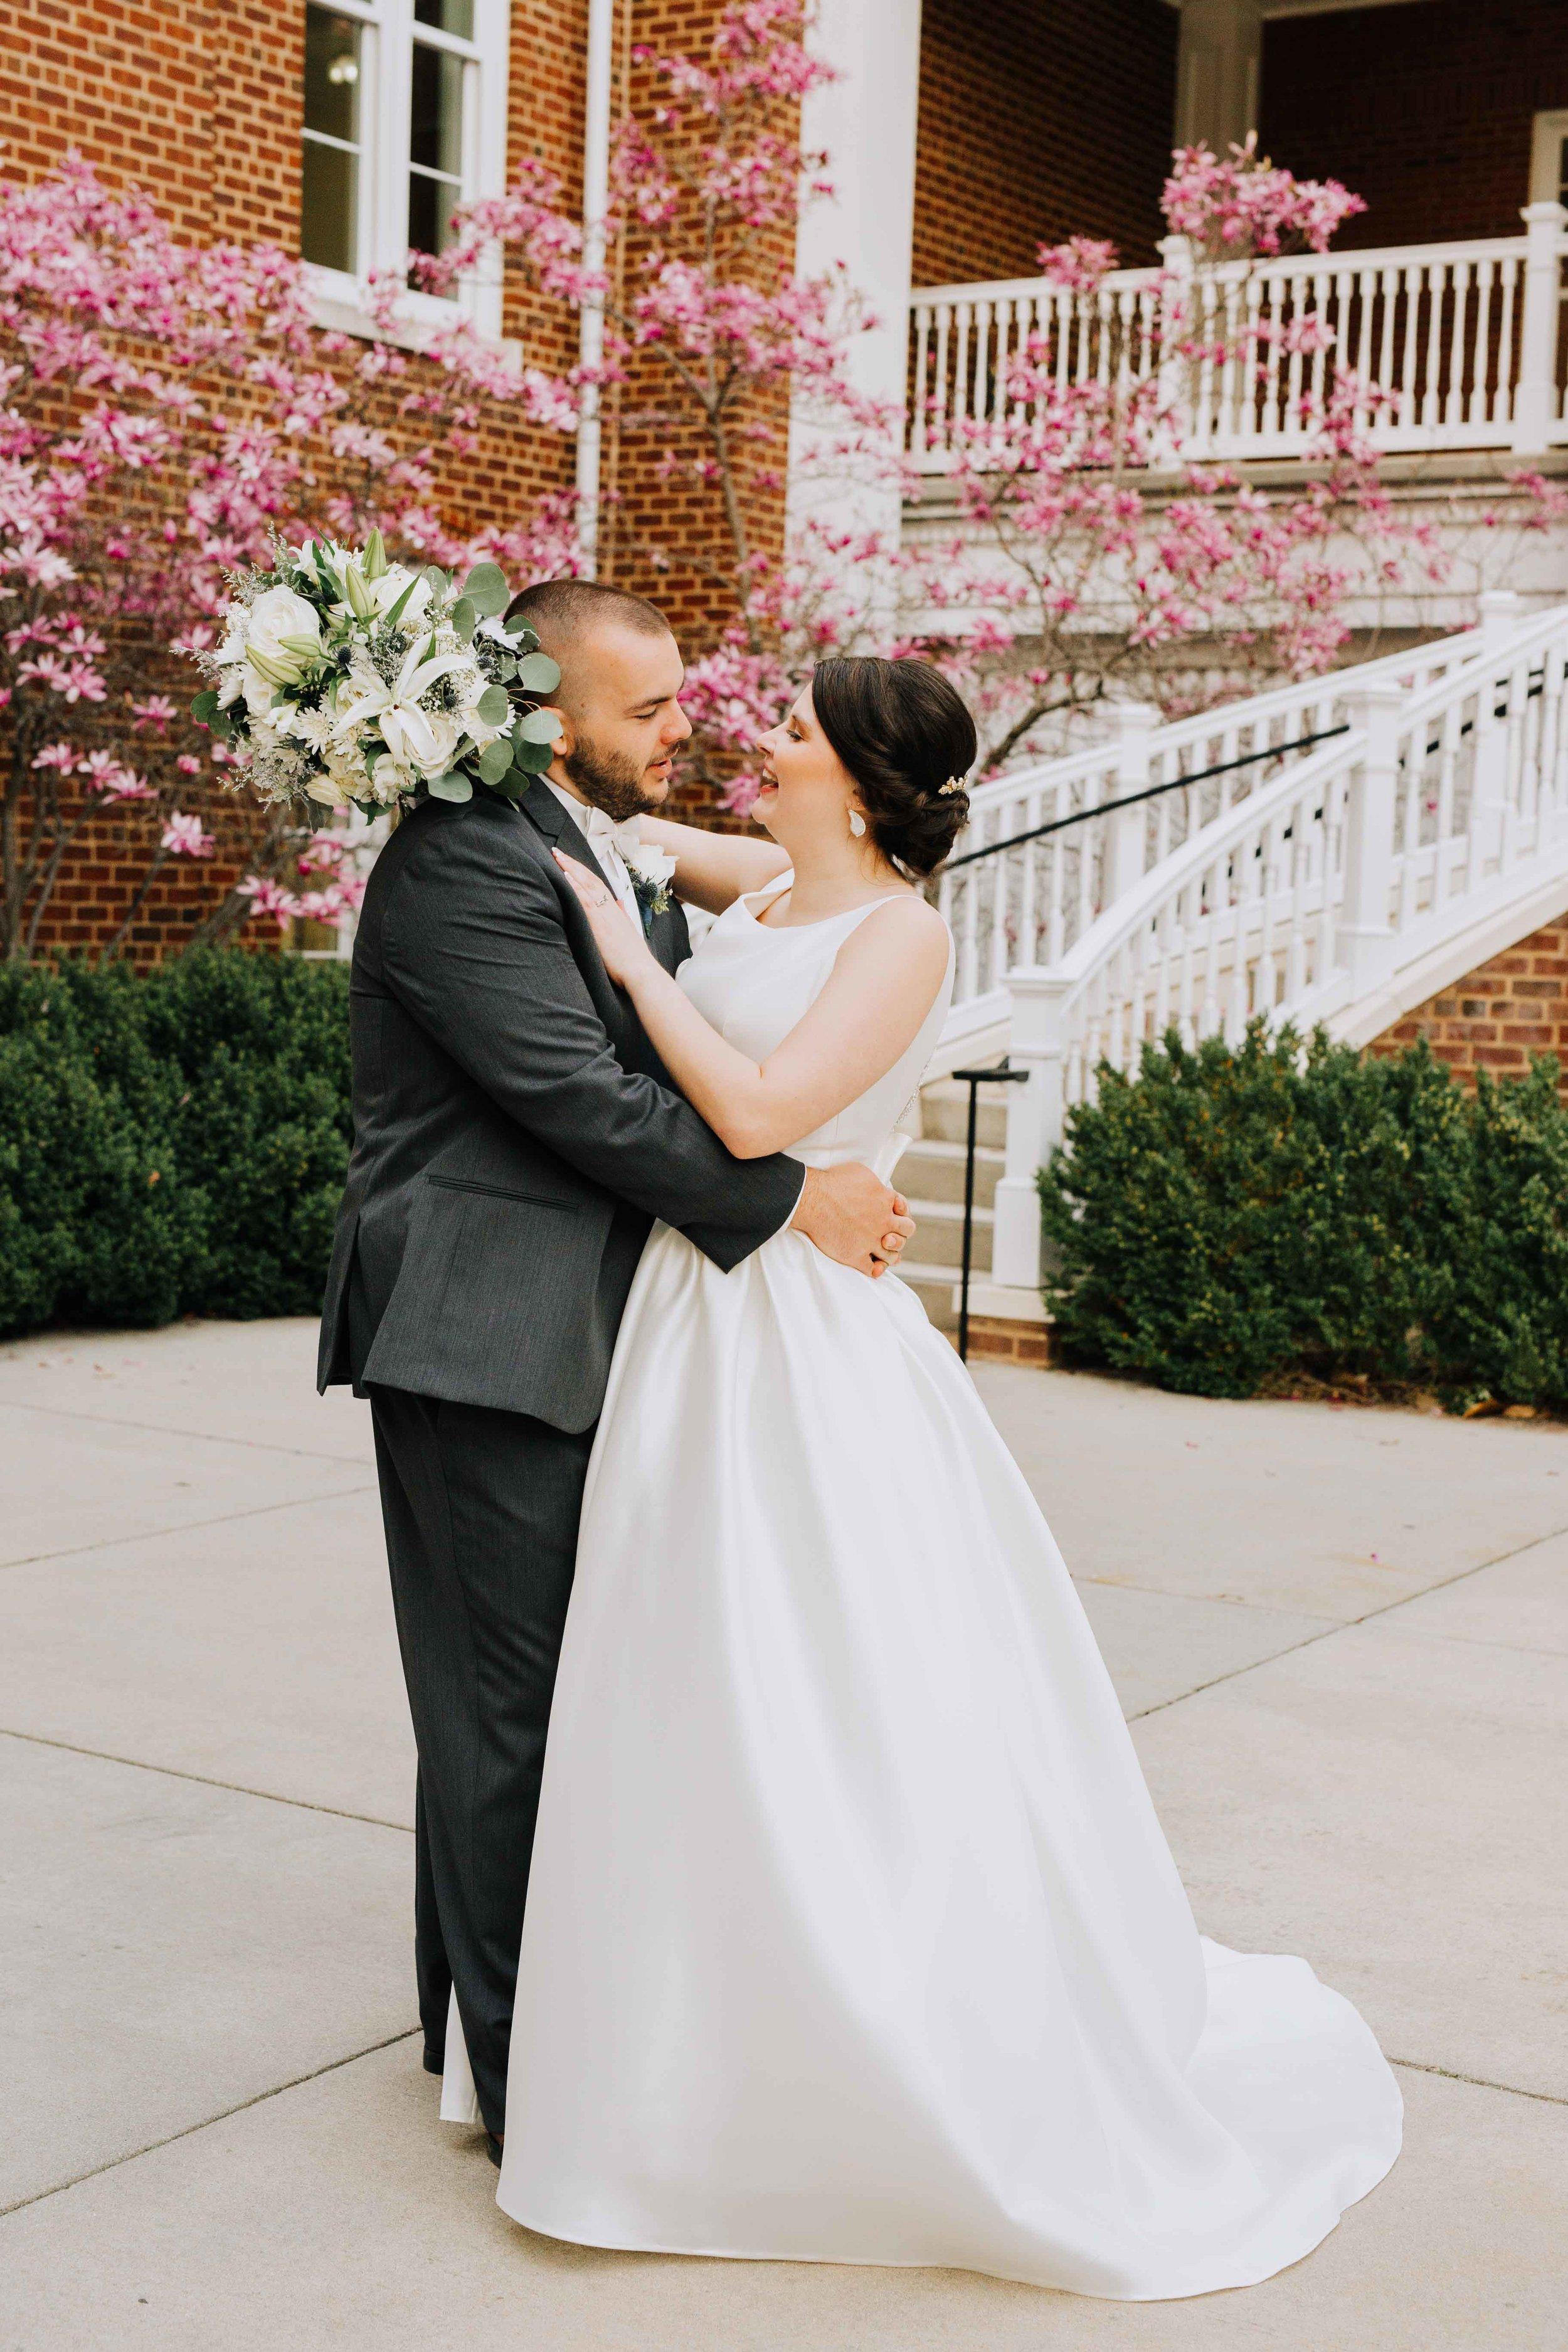 Farmville-Virginia-Wedding-Hotel-Weynoke-Downtown-Jacqueline-Waters-Photography-Detailed- (1228).jpg